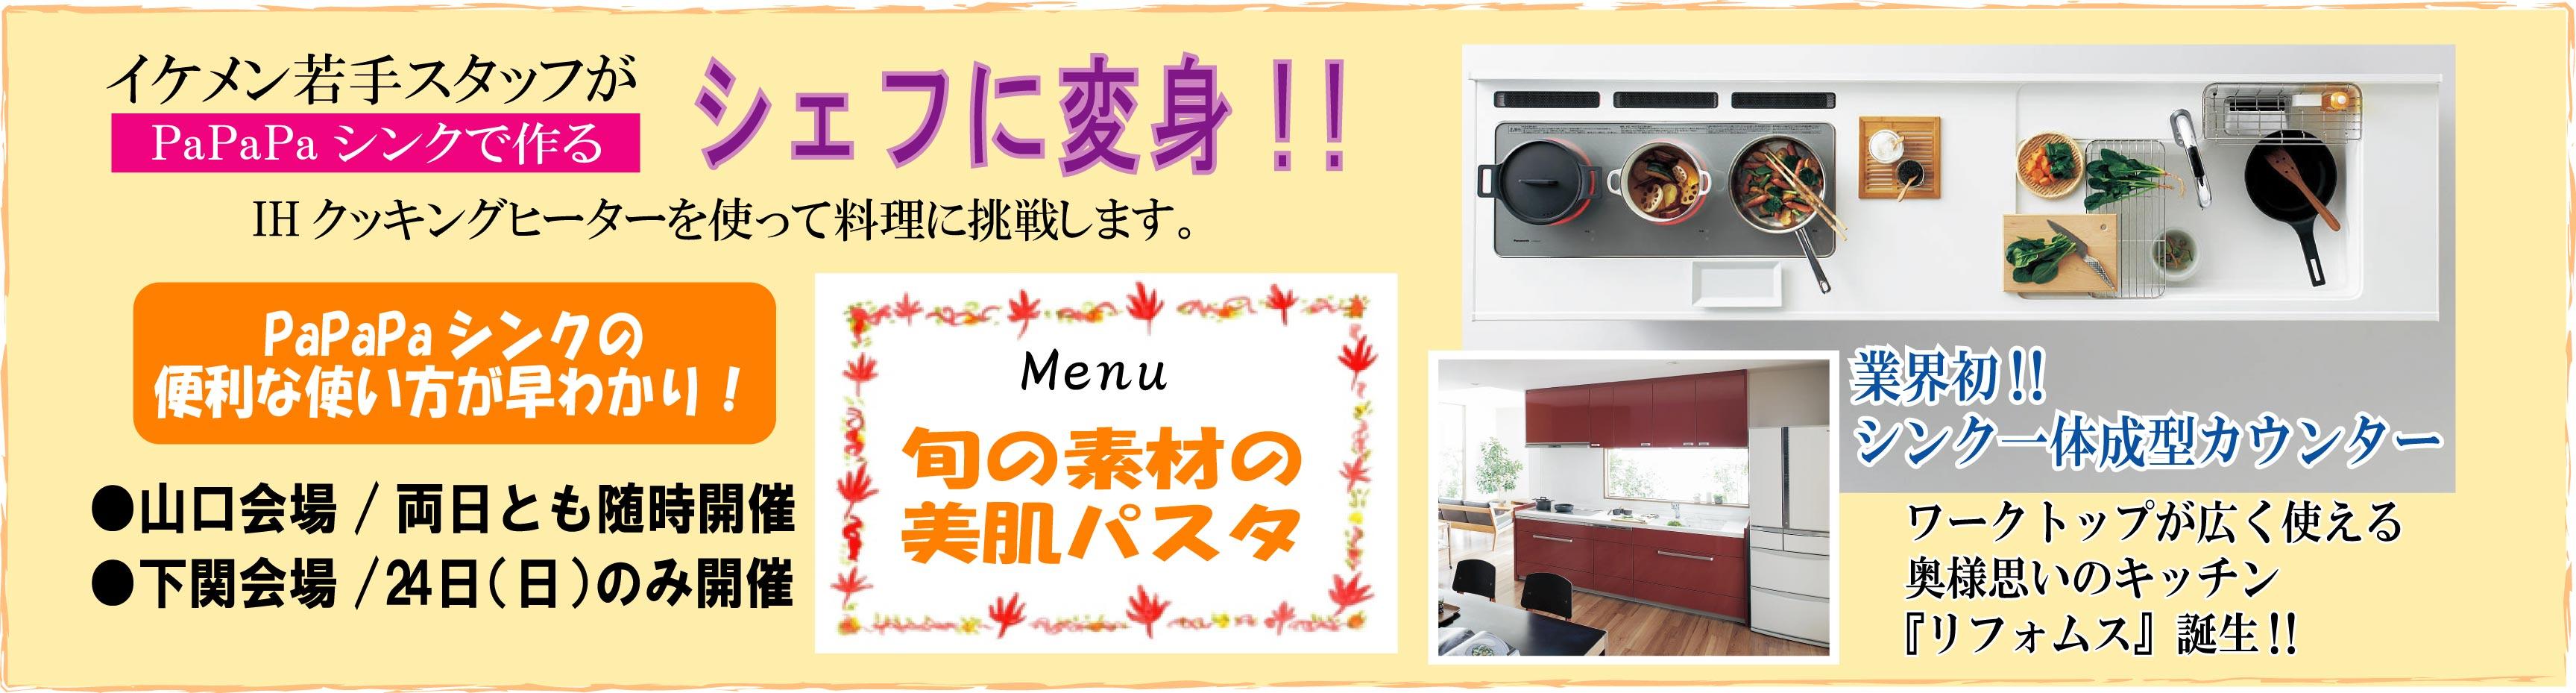 KuraSi-natu-sin78-04.jpg